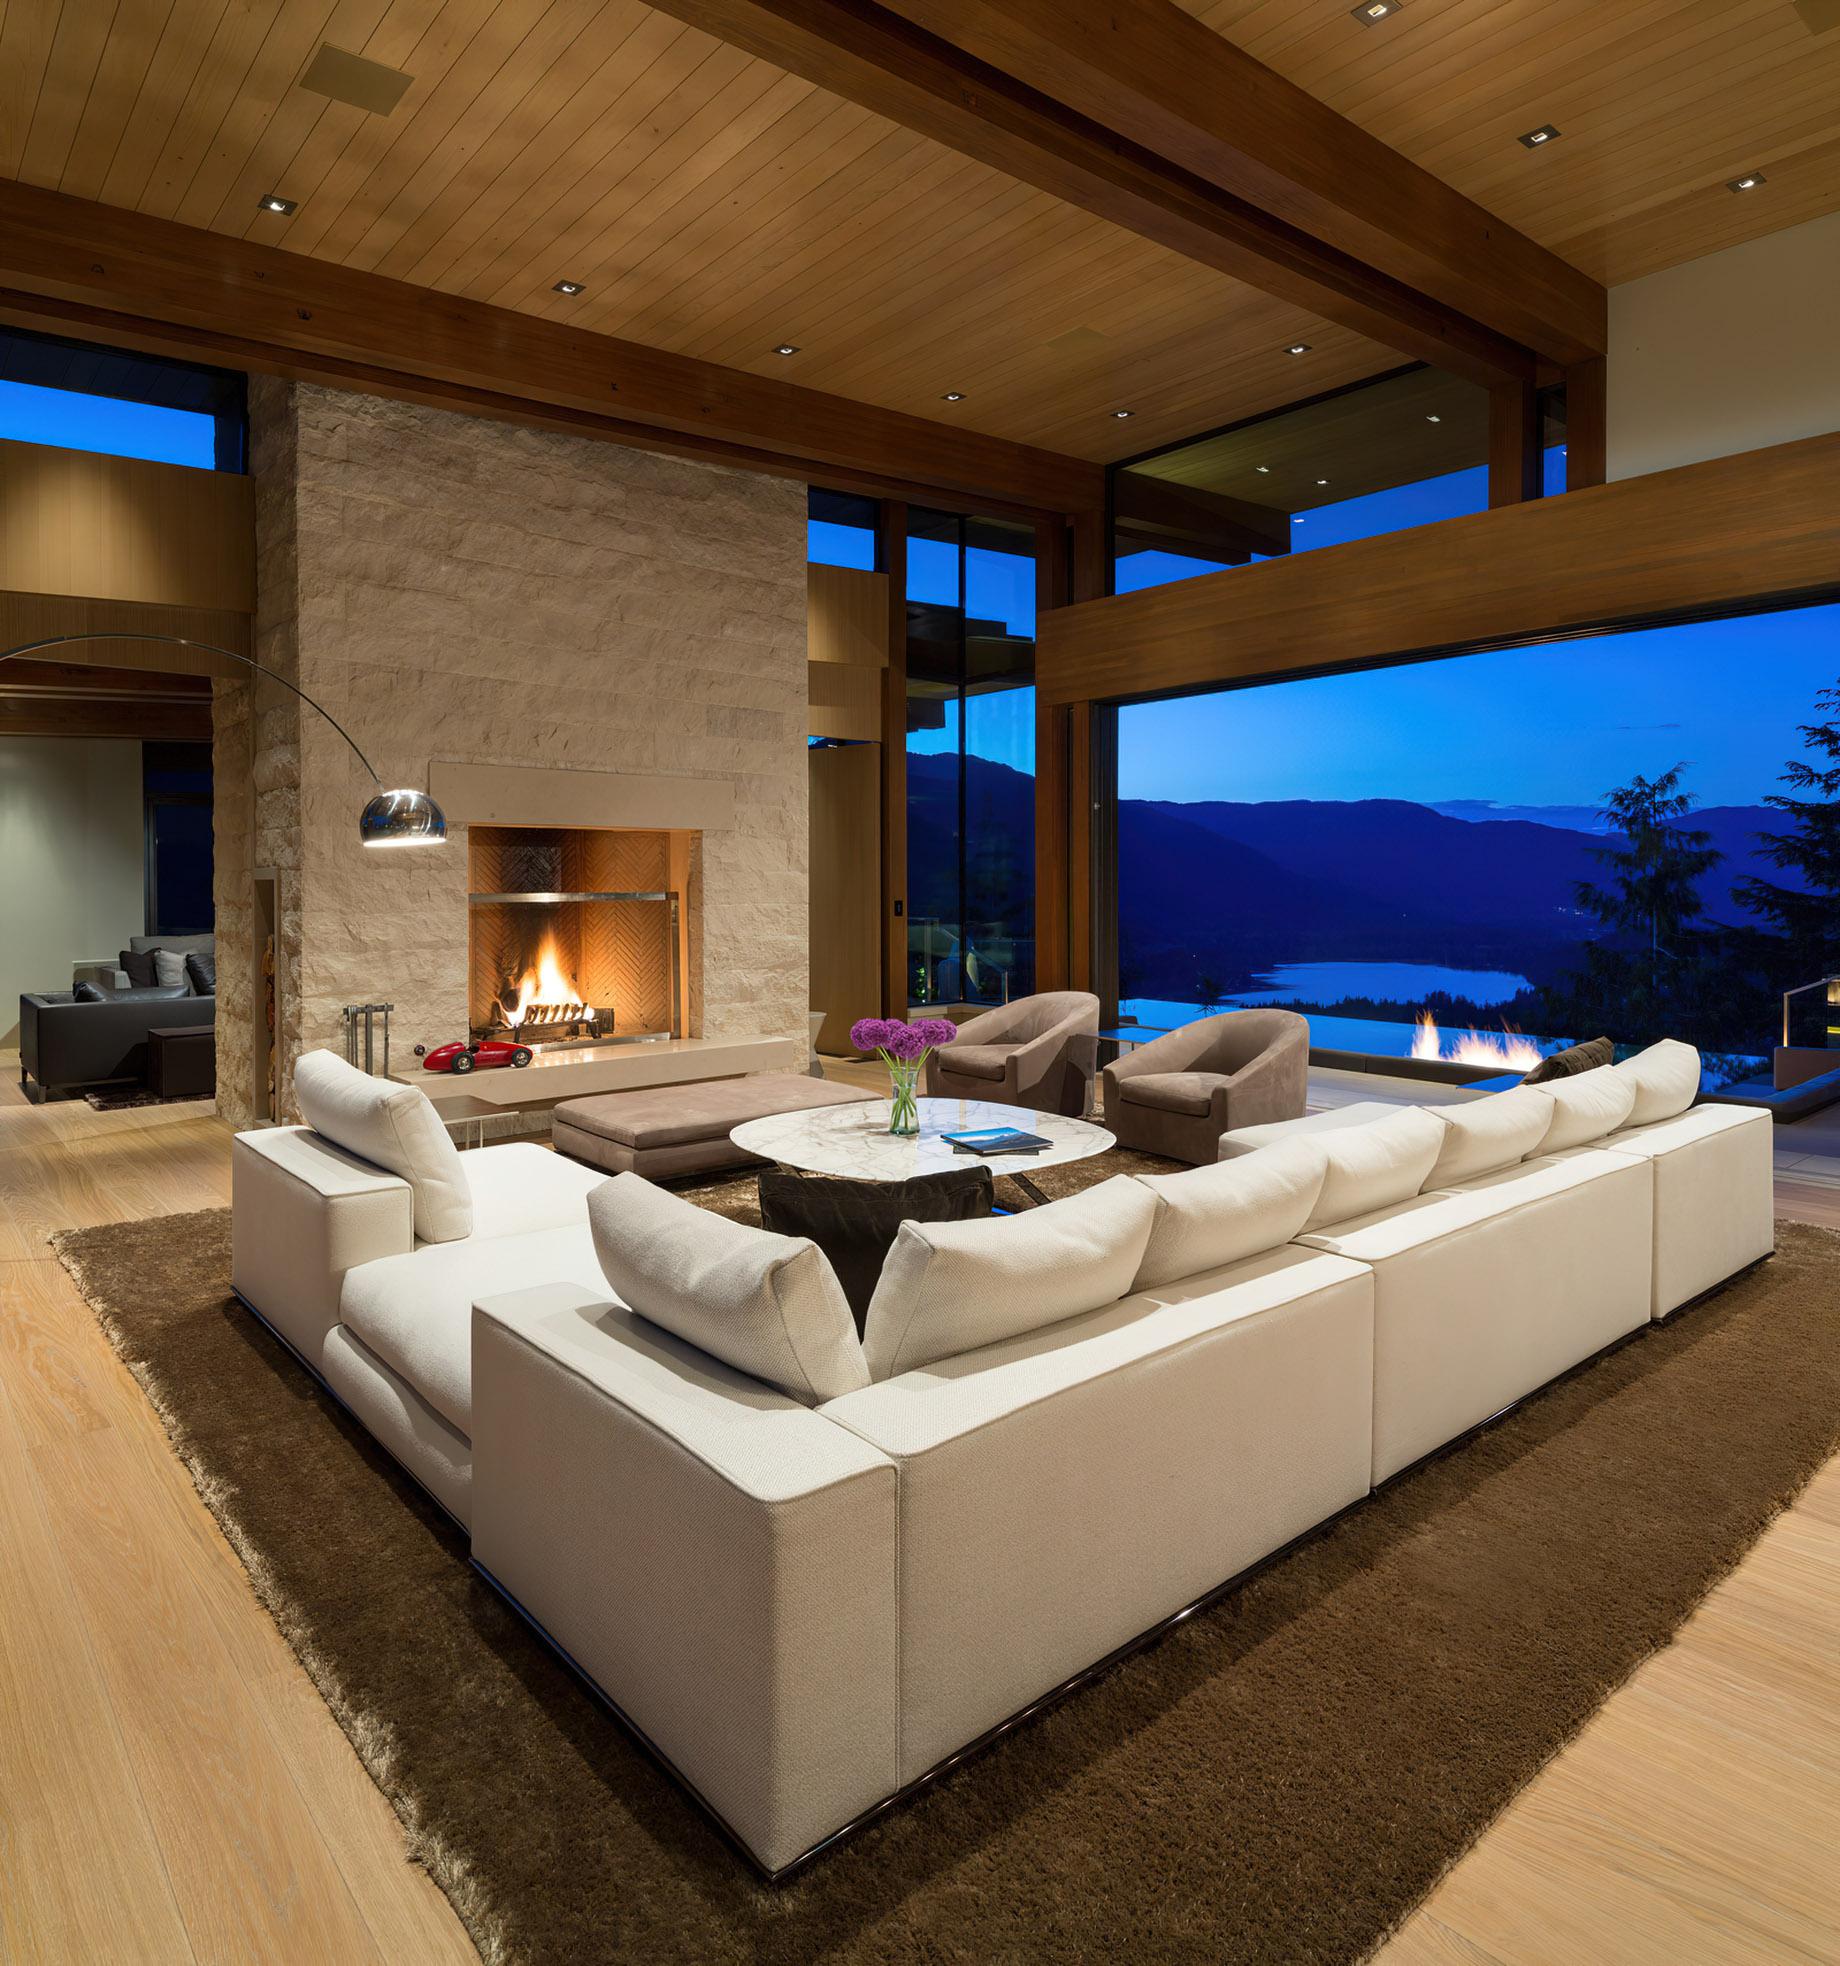 High Point Kadenwood Luxury Estate – High Point Dr, Whistler, BC, Canada